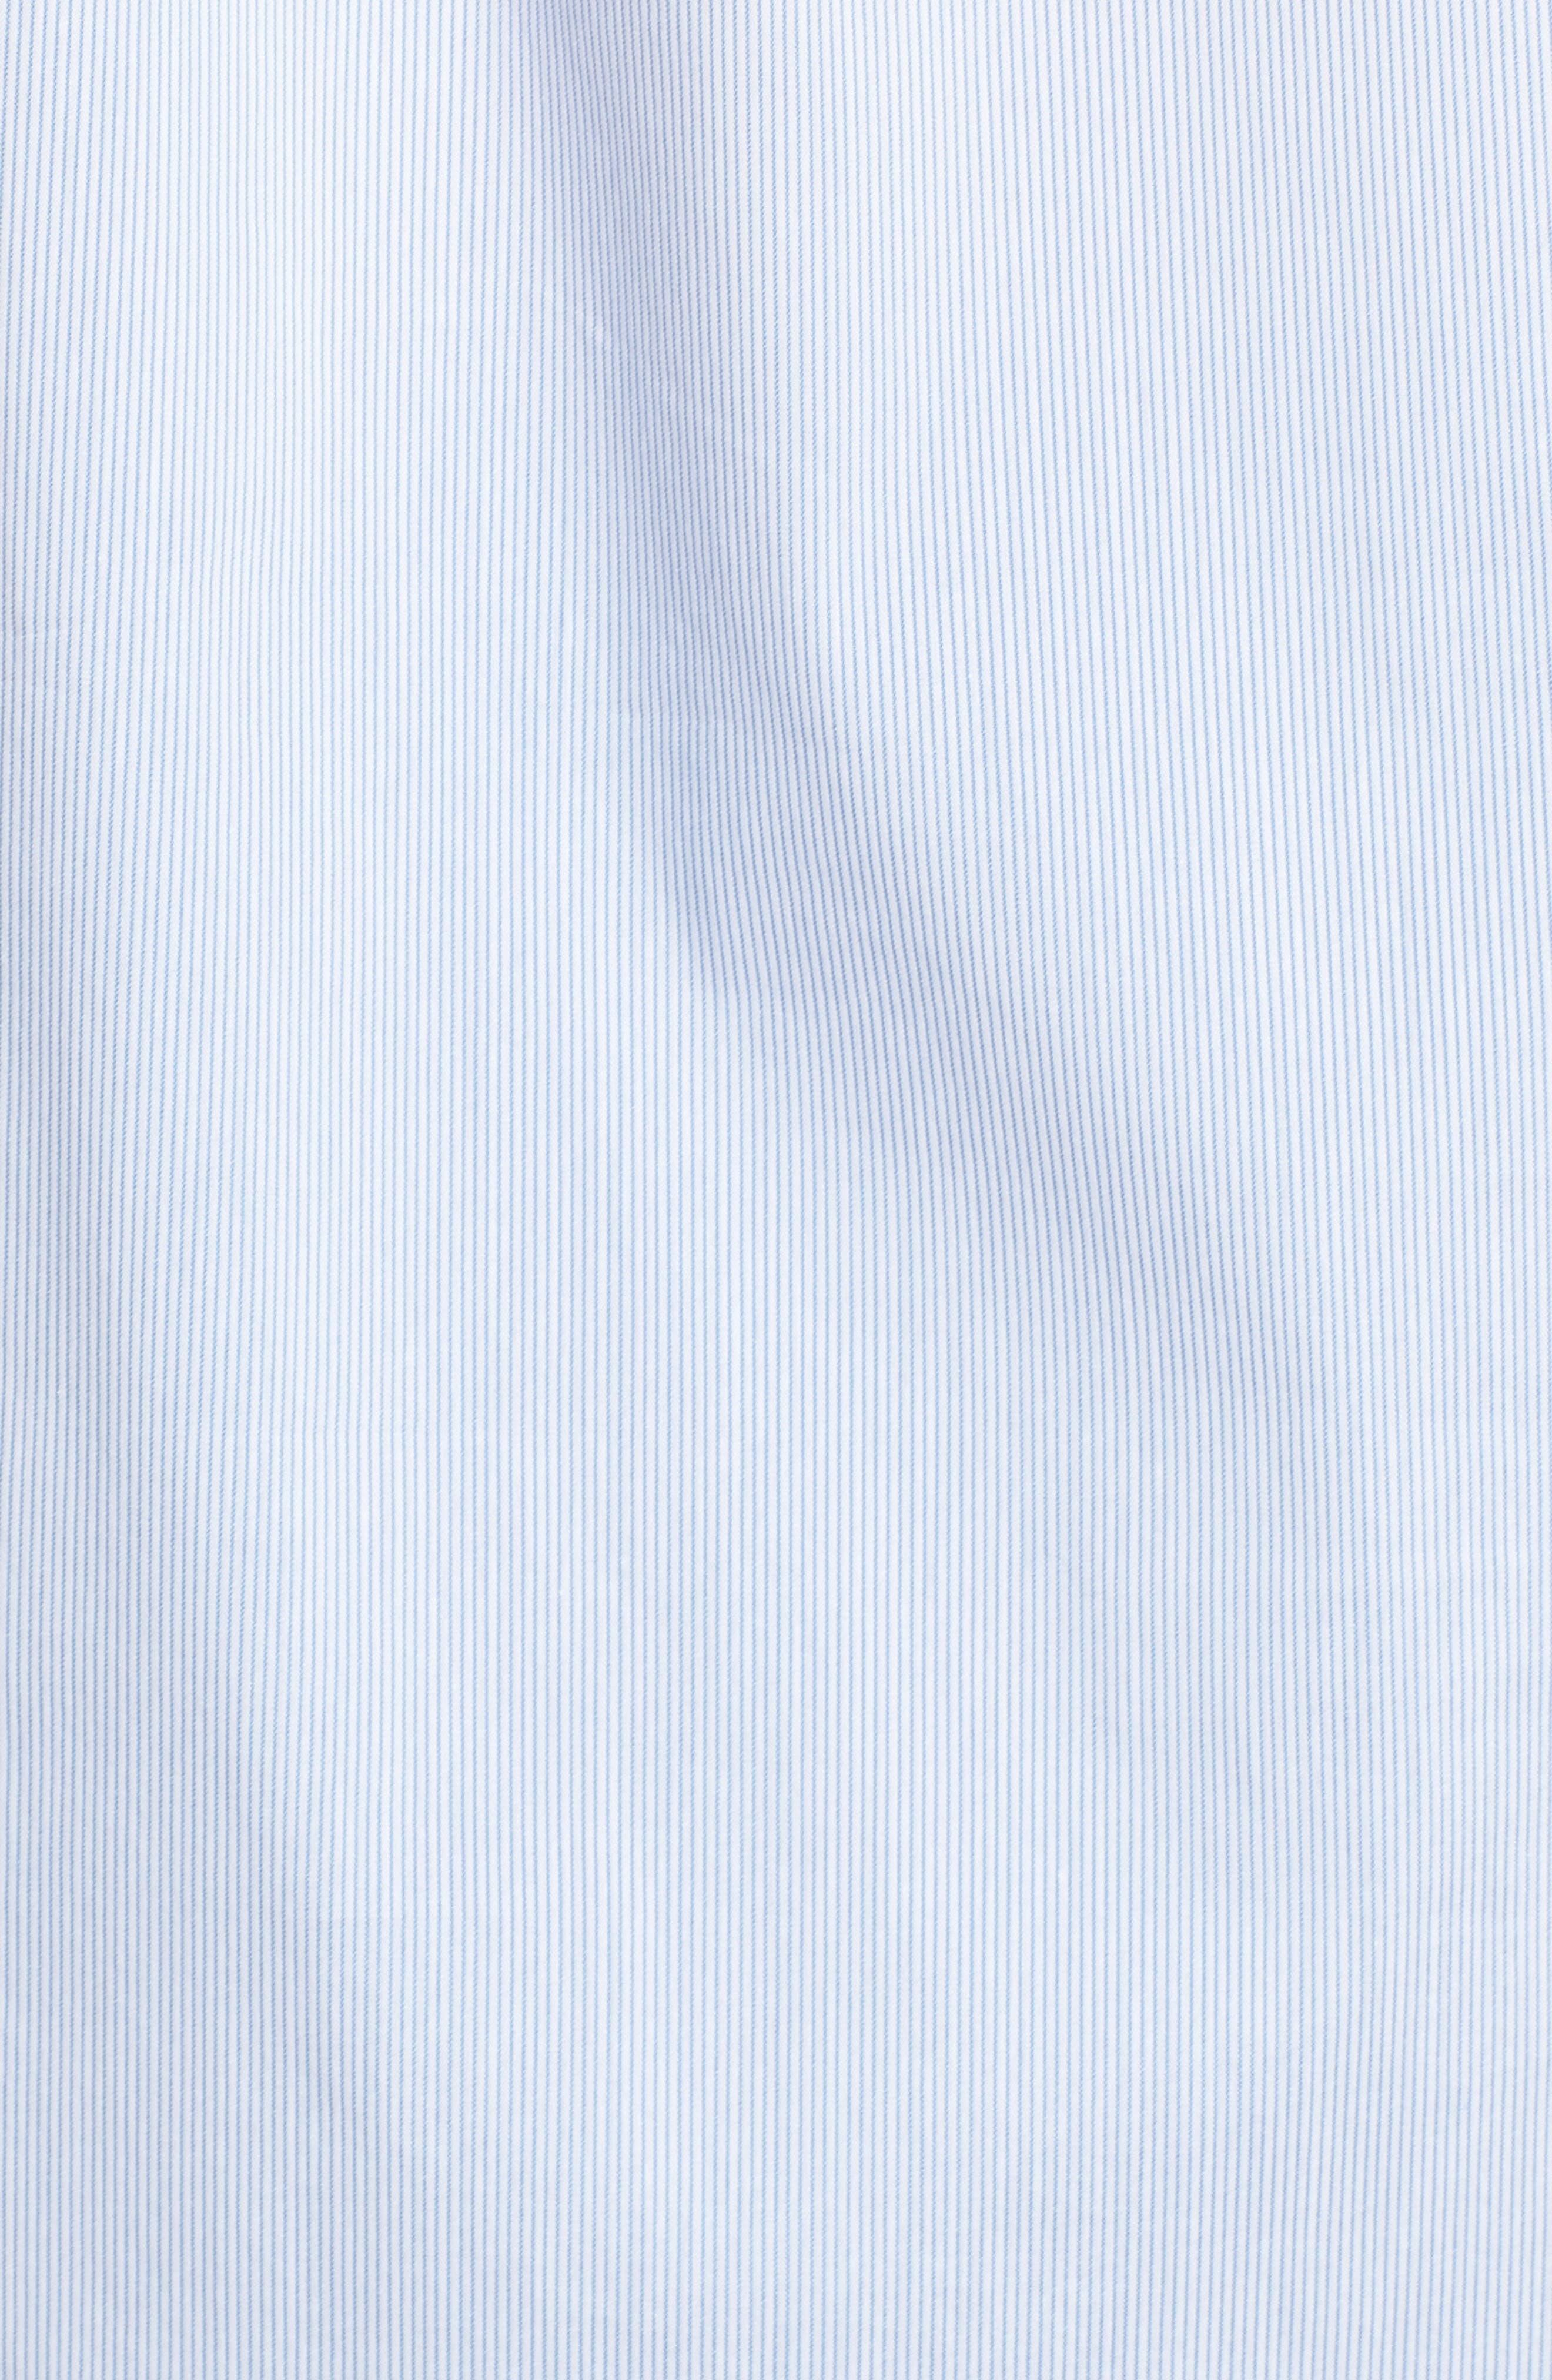 Off the Shoulder Stretch Poplin Shirt,                             Alternate thumbnail 5, color,                             Blue- White Mini Stripe